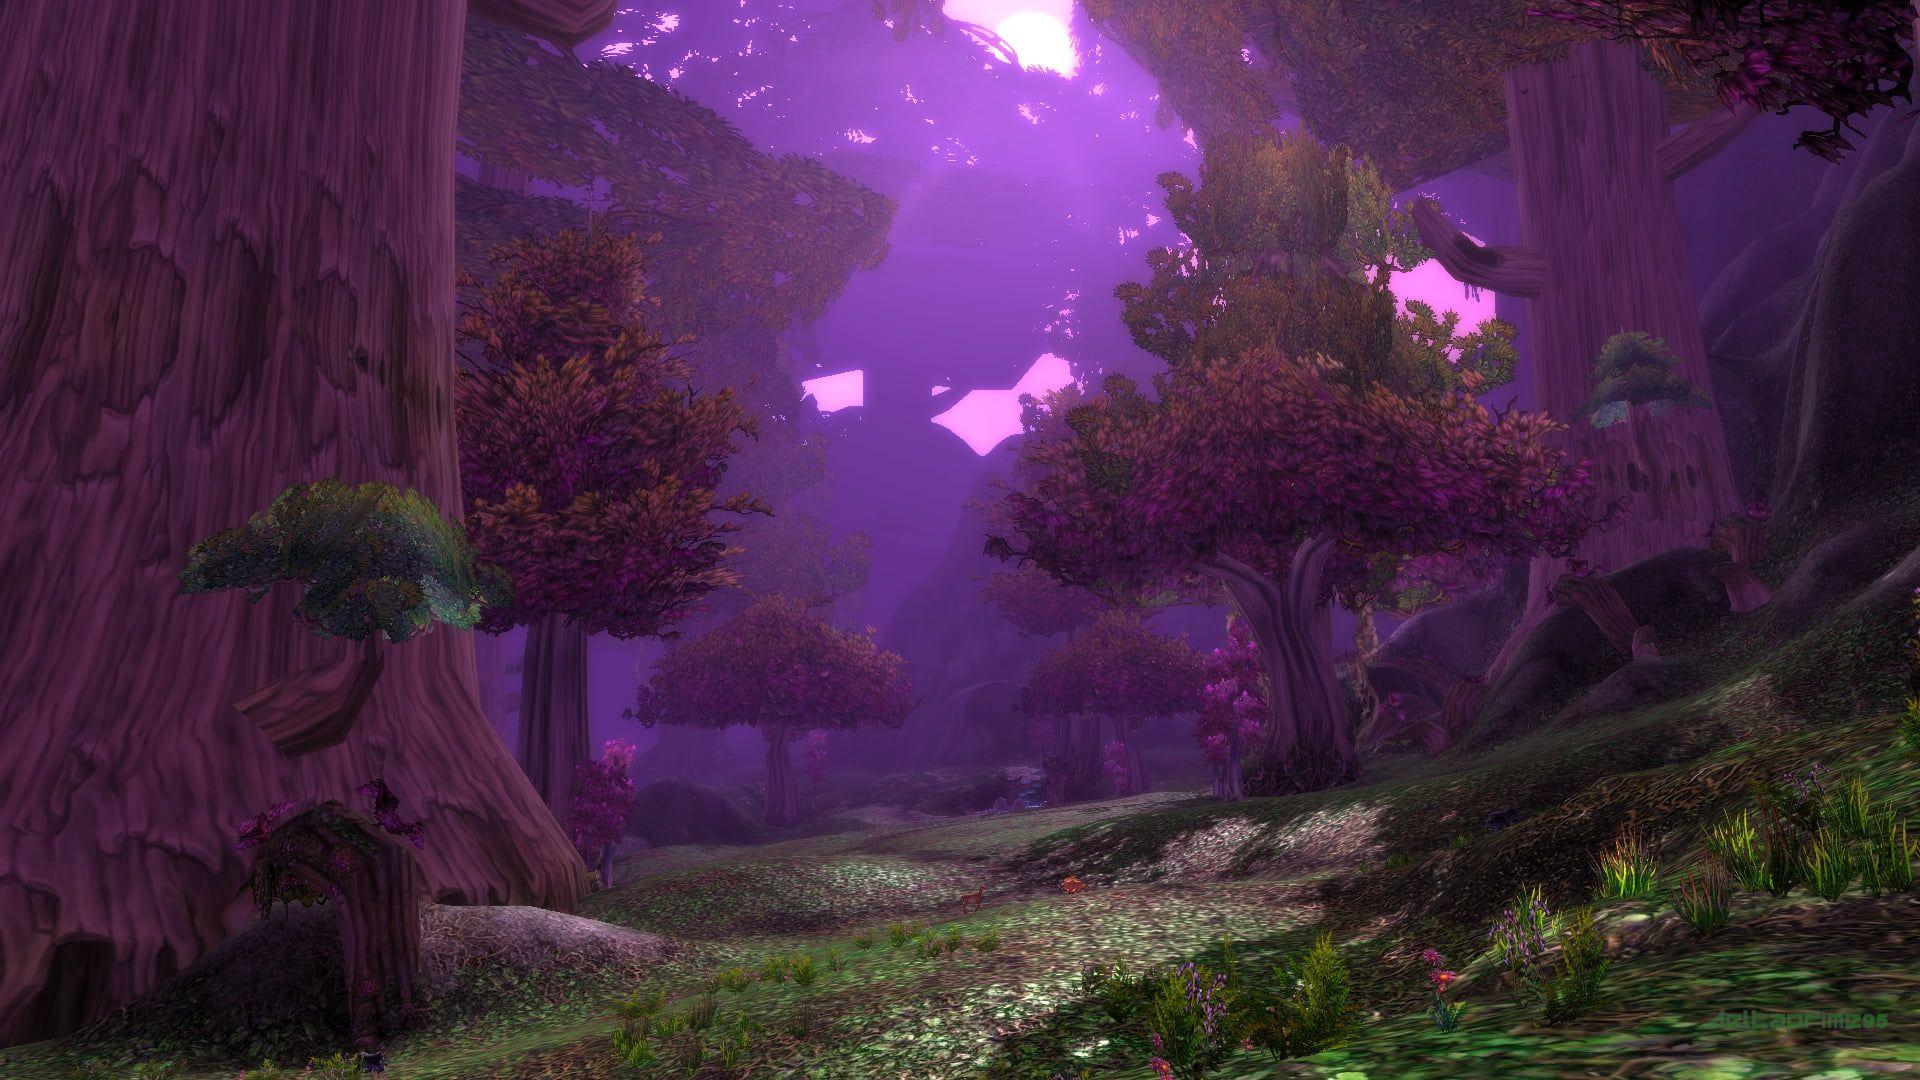 World Of Warcraft Teldrassil Shadowglen Night Elves Forest Pc Gaming In Game Photography Screen Shot 1080p World Of Warcraft Wallpaper Warcraft Night Elf